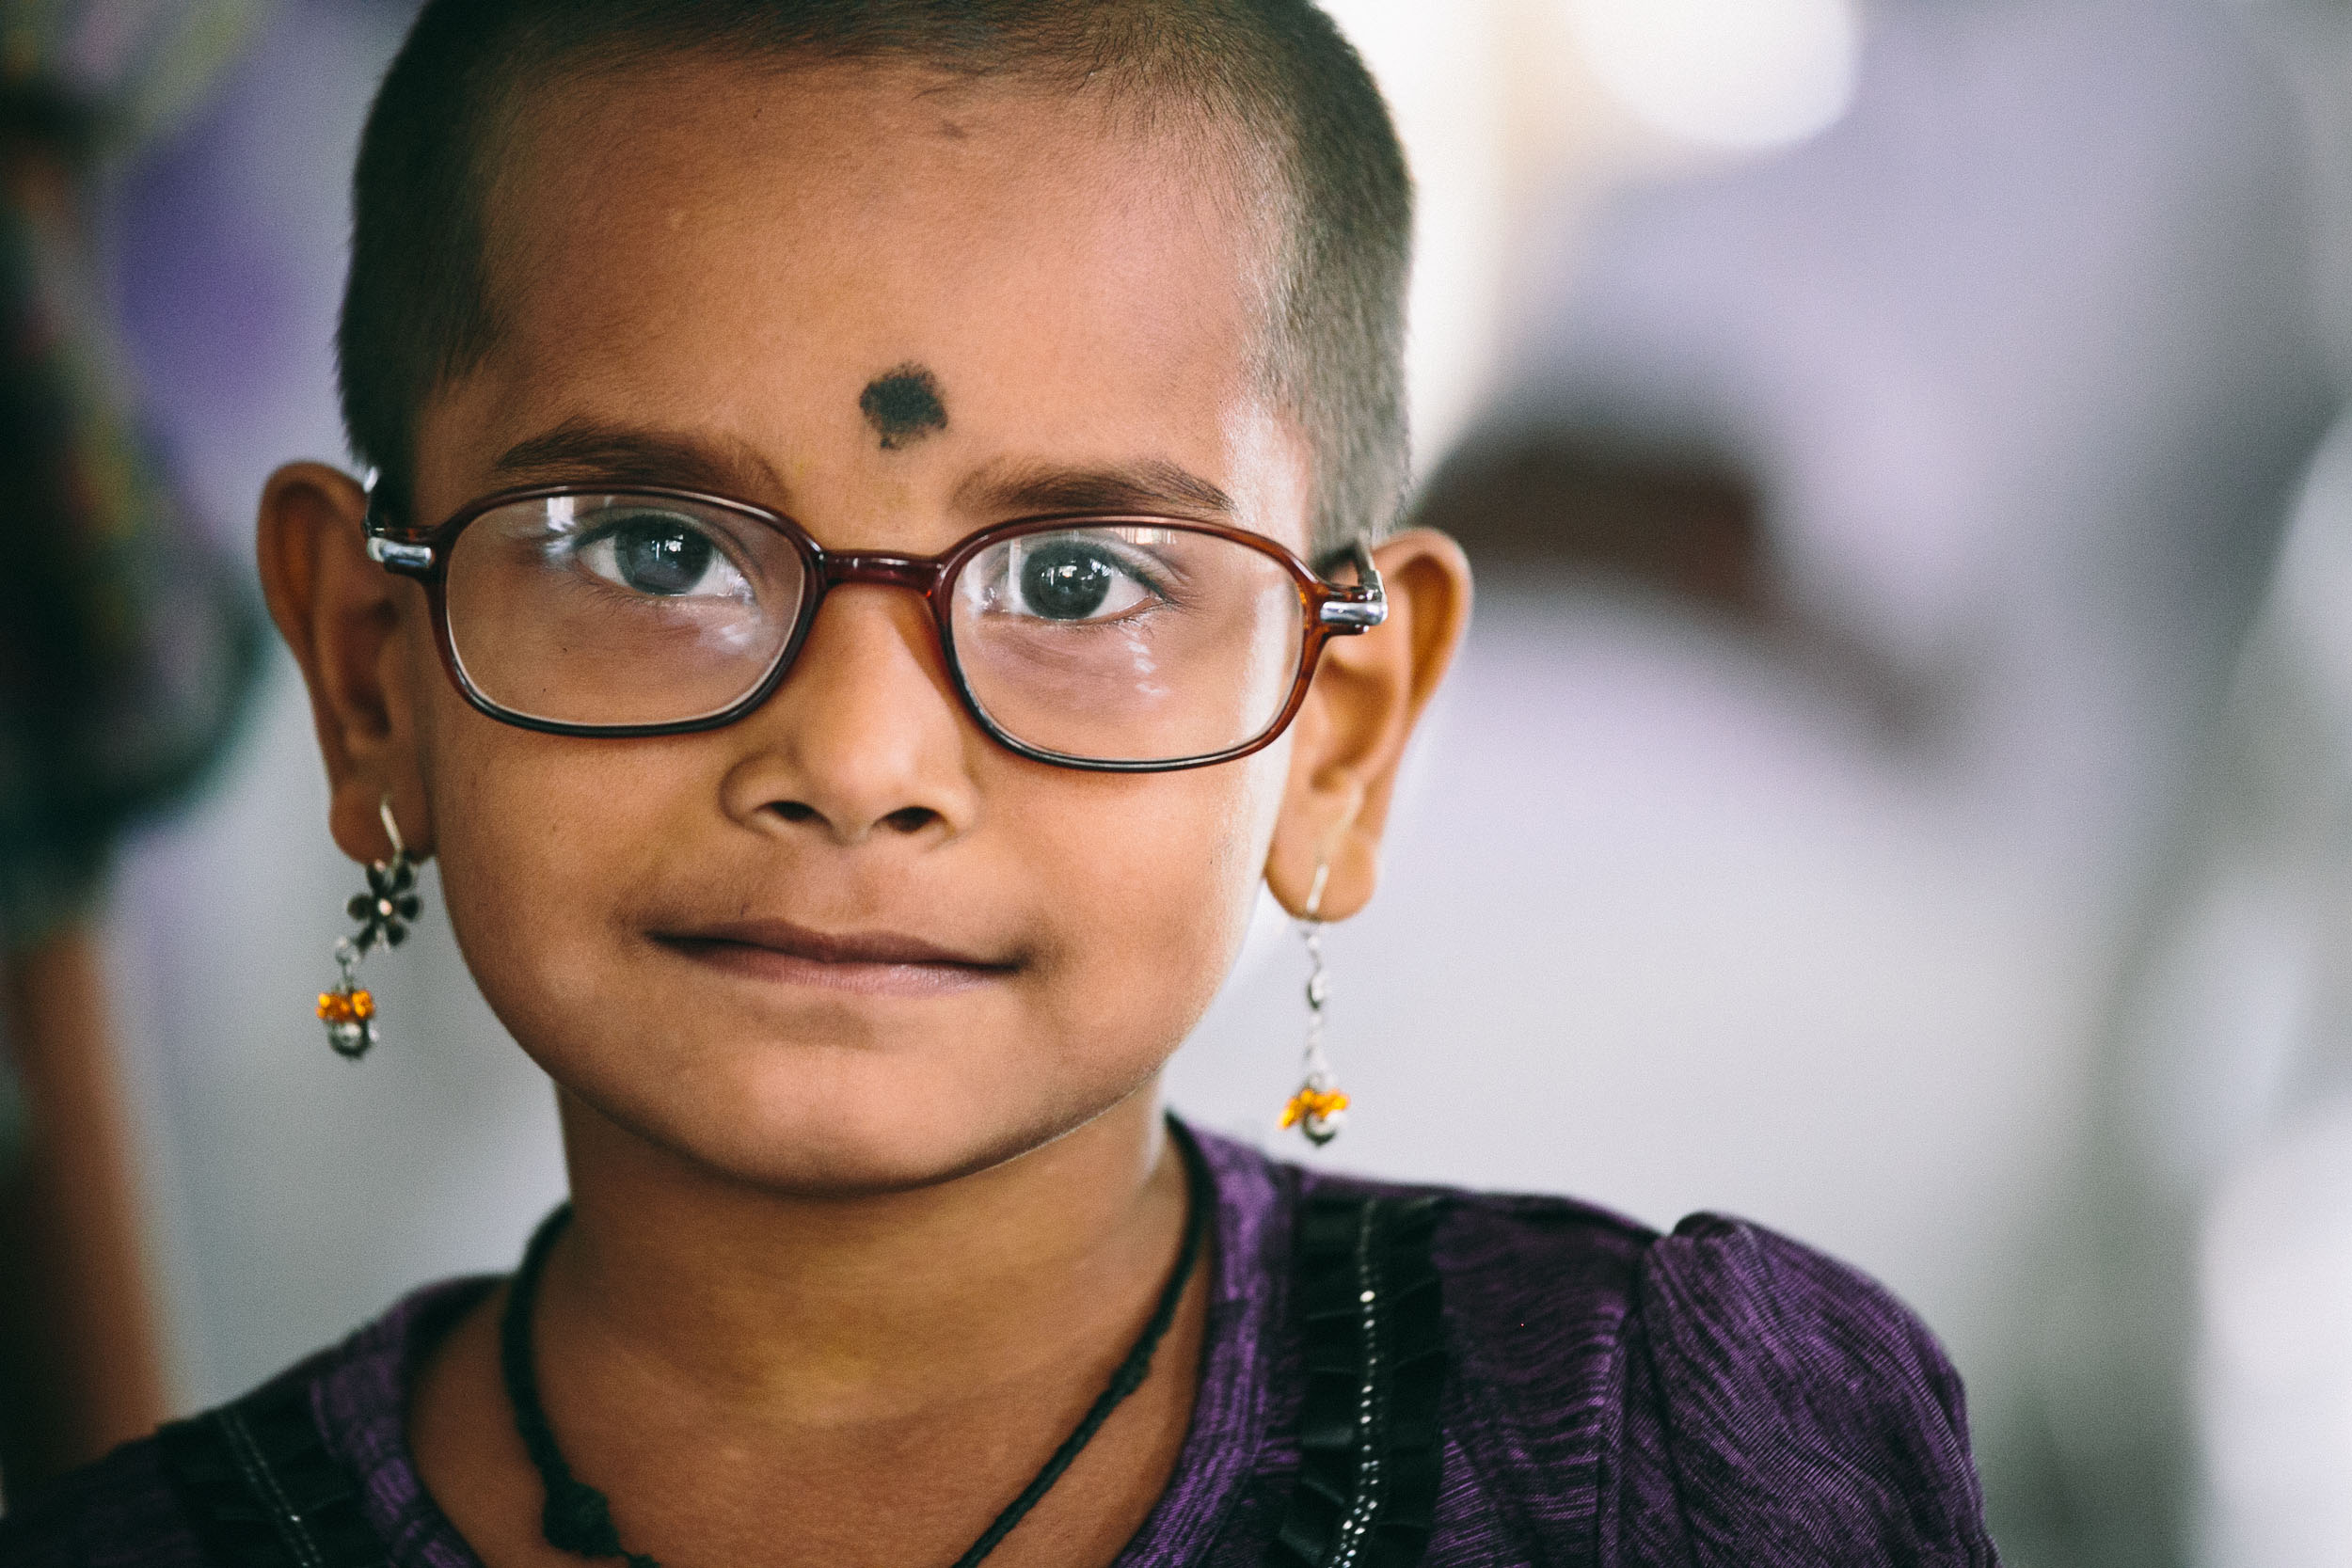 brian-callaway-india-photography-aravind-eye-hospital-30.jpg